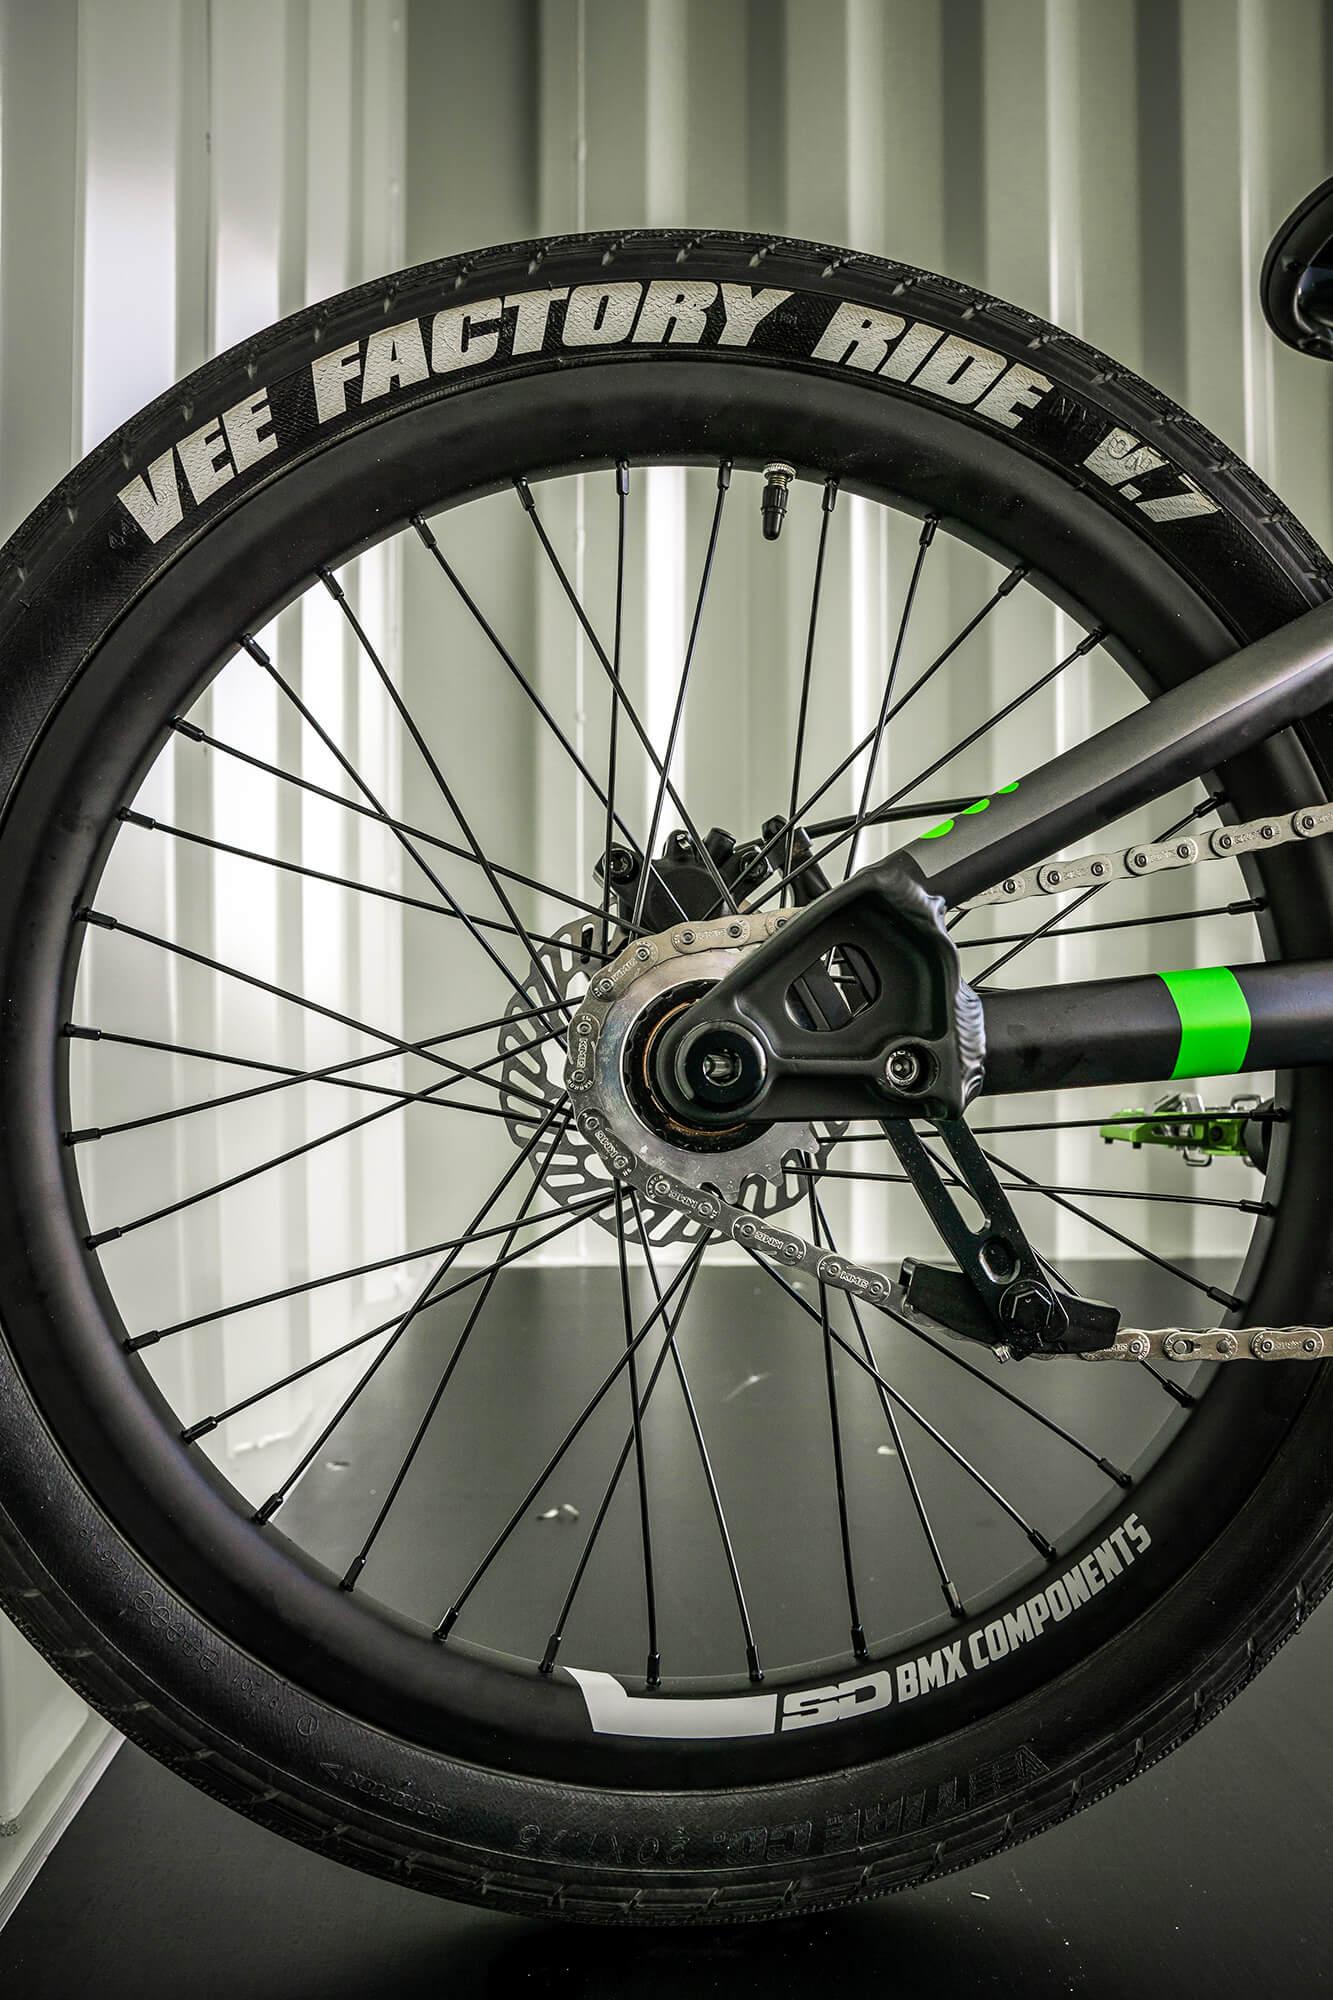 Team Oegema TVE Bike Check 2020 - DSC02168 - Niel Bensink